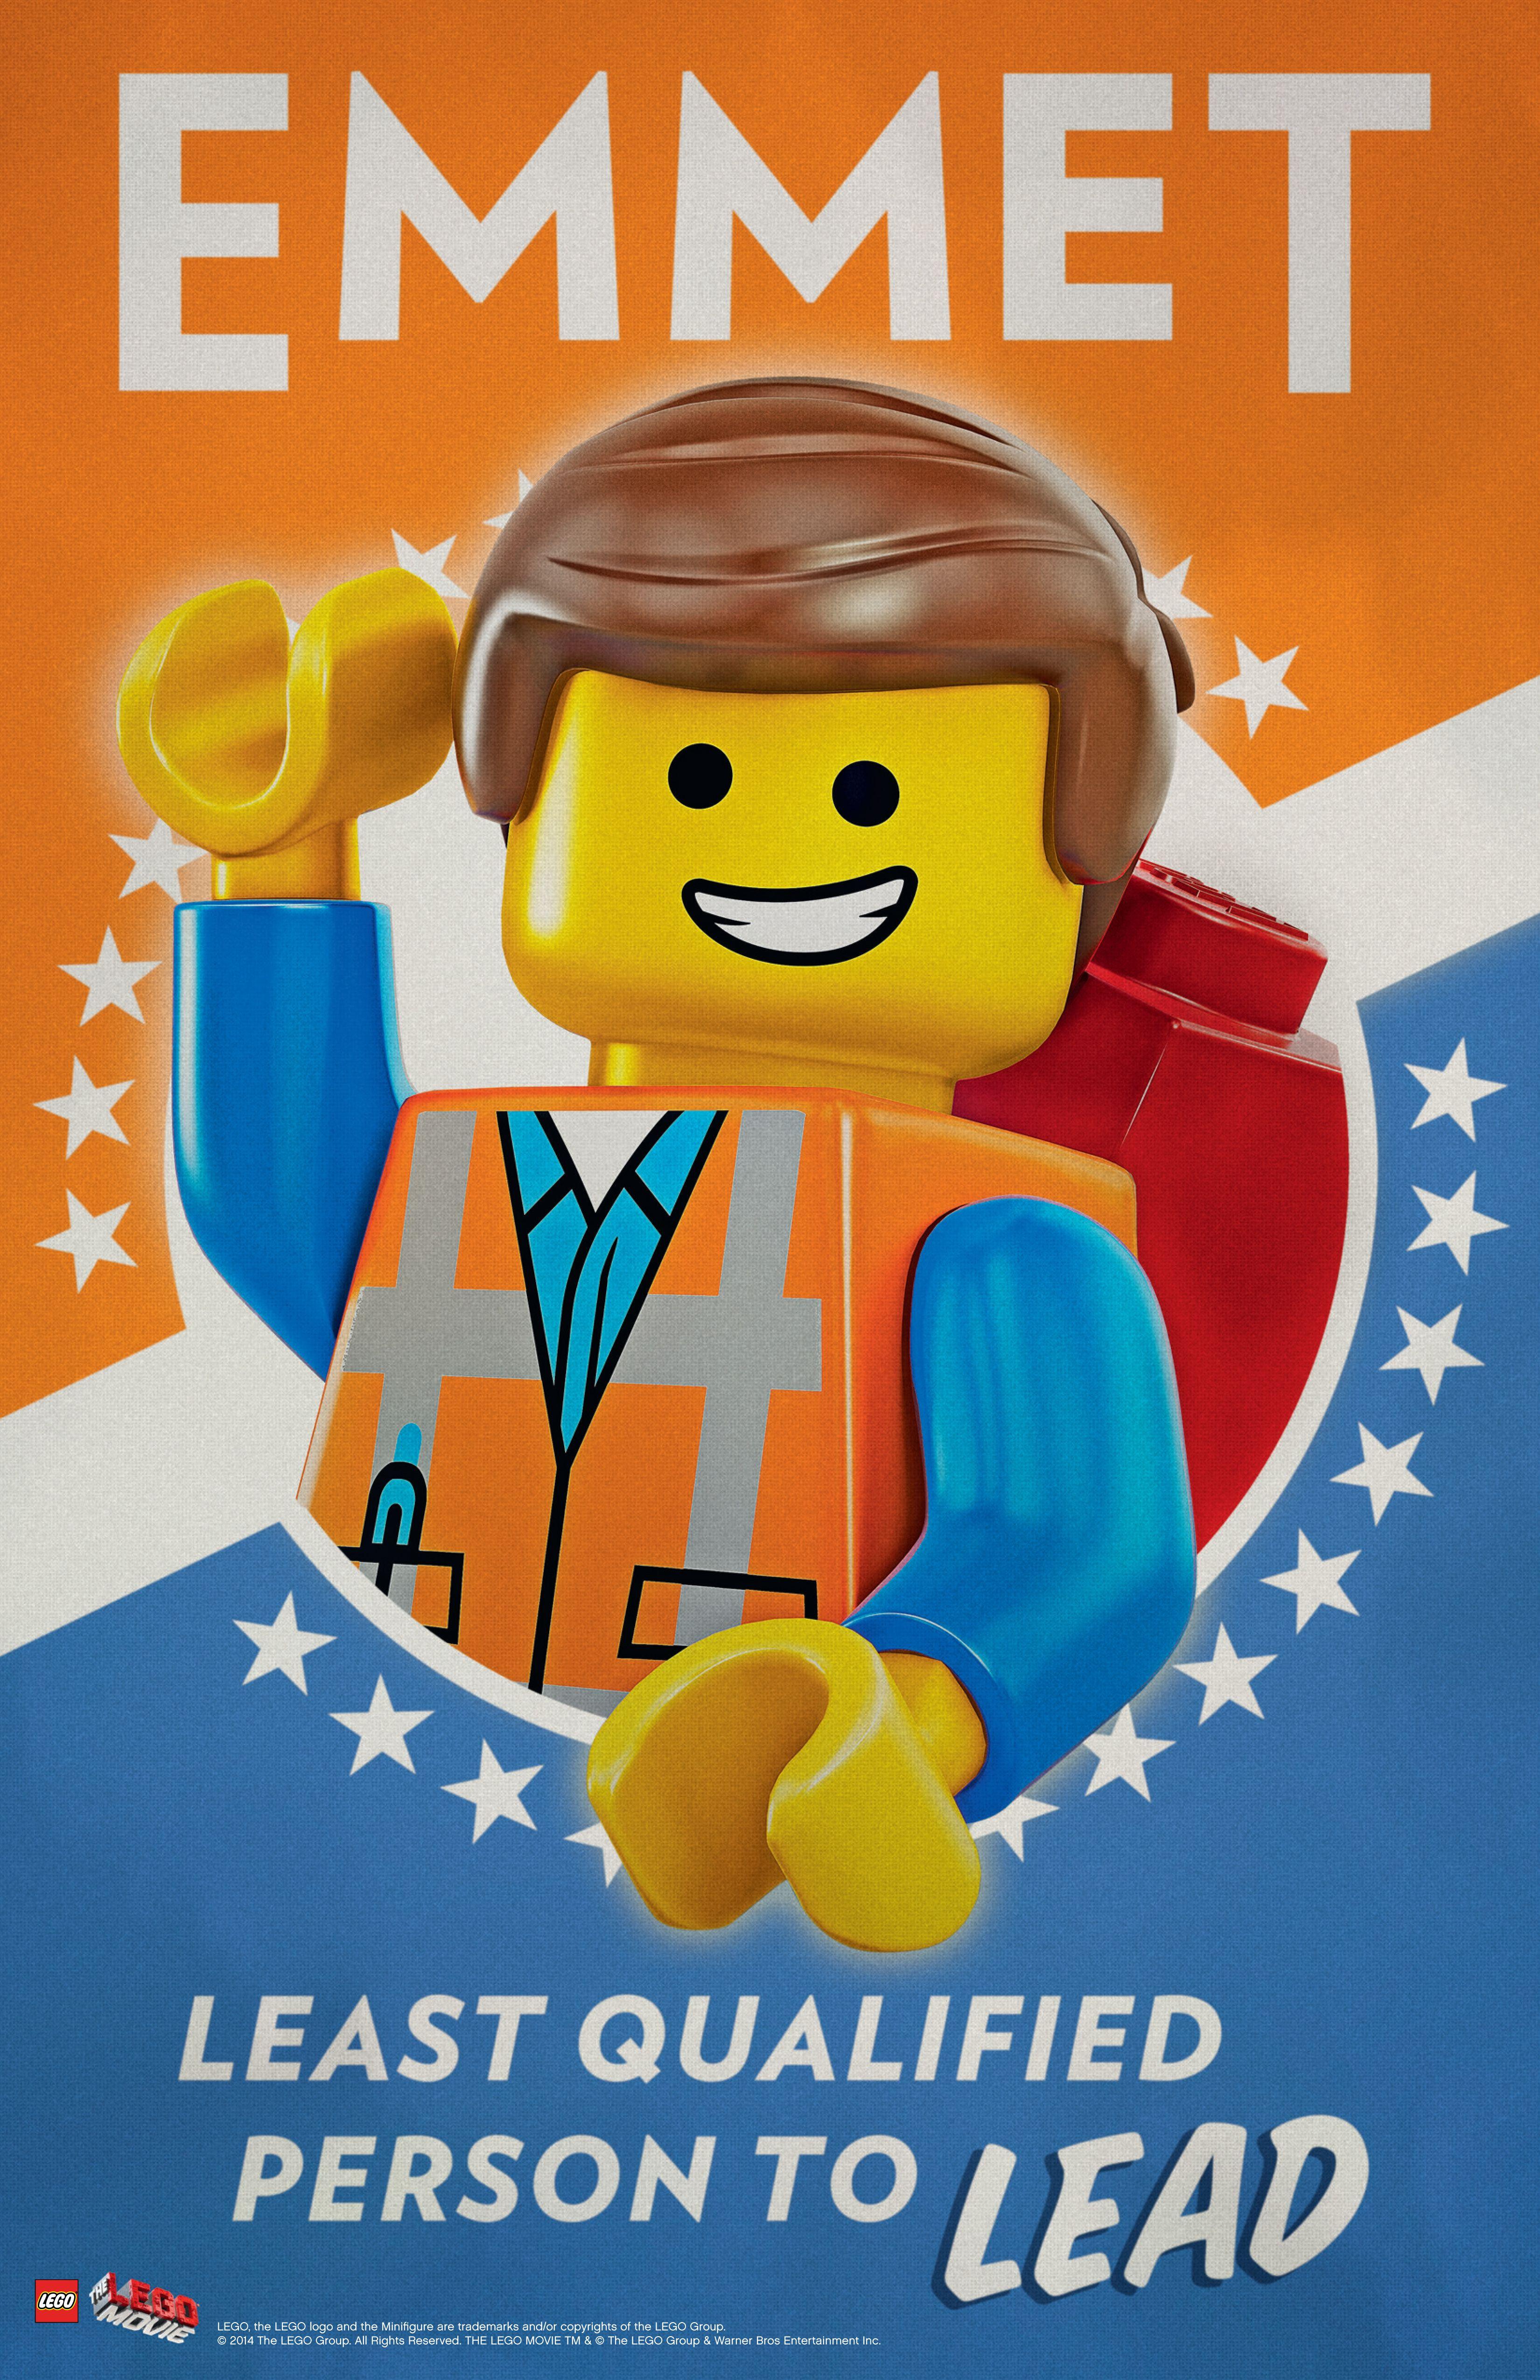 LEGO MOVIE PARTY - Decorations - FREE 11x17 LEGO Movie Emmet ...